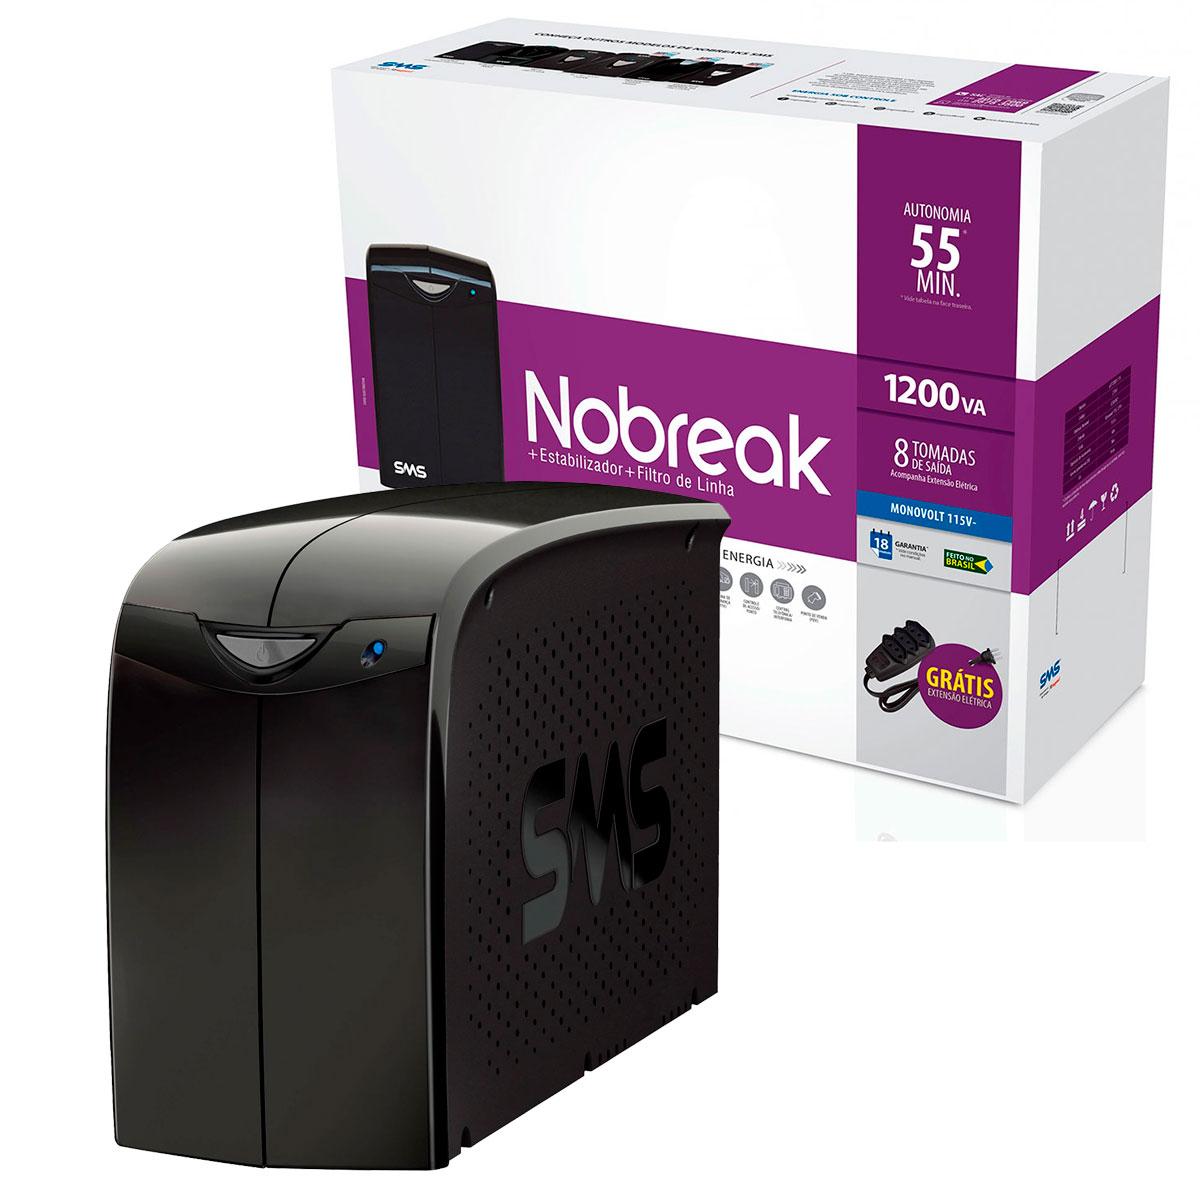 Nobreak 1200VA SMS Station II Ent. Mono 115/127V, Saída 115V, 8 Tomadas (6 Traseiro + Ext.) - 27393